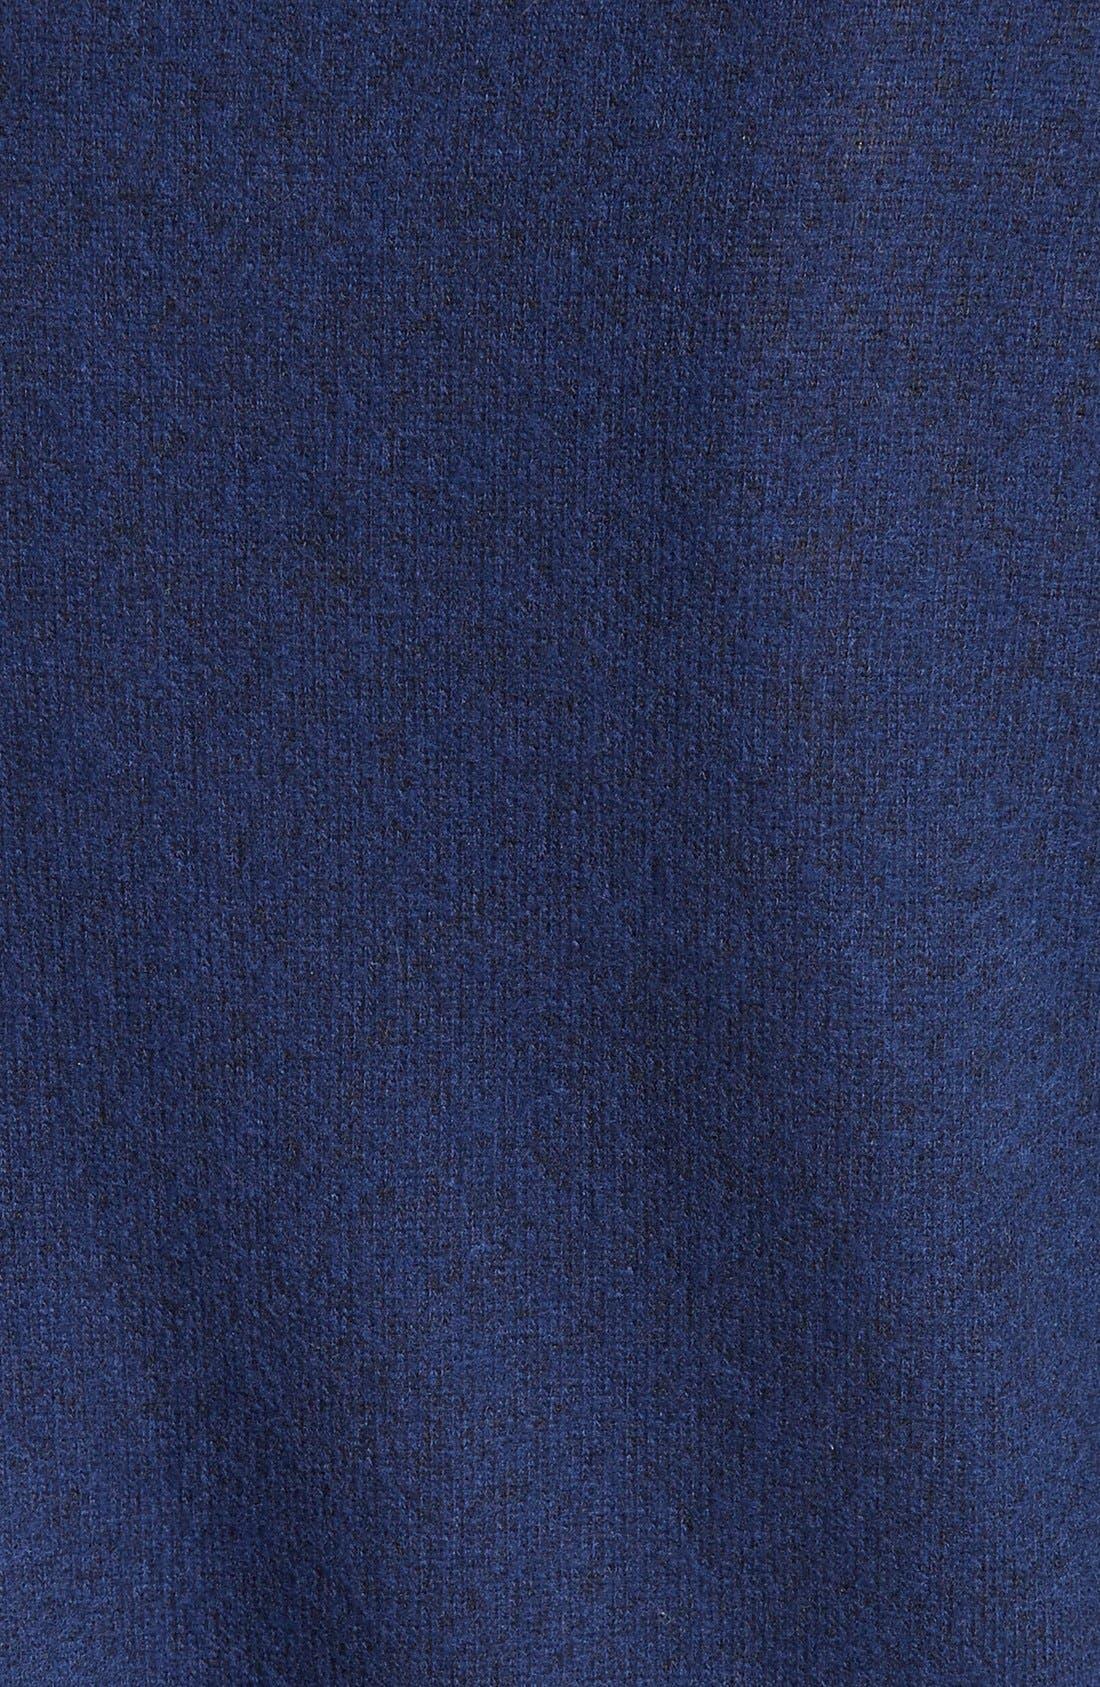 Soft Joie Giardia Drop Shoulder Sweater,                             Alternate thumbnail 5, color,                             Peacoat